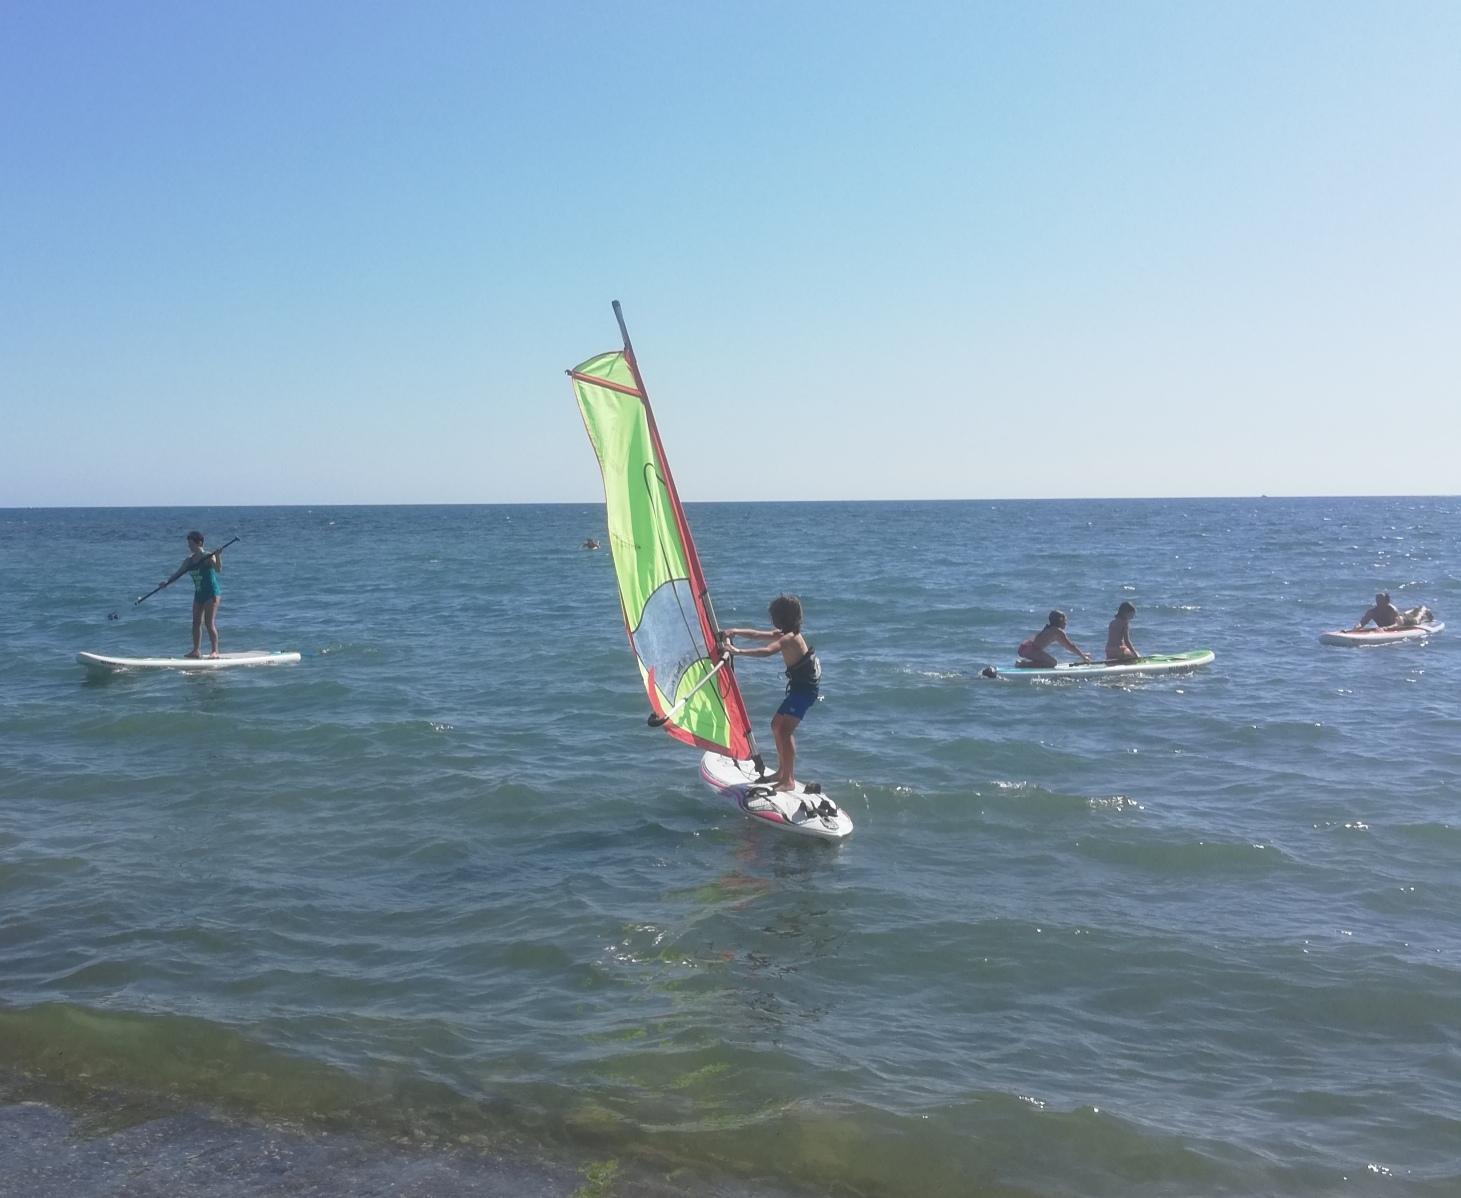 corso windsurf ragazzi